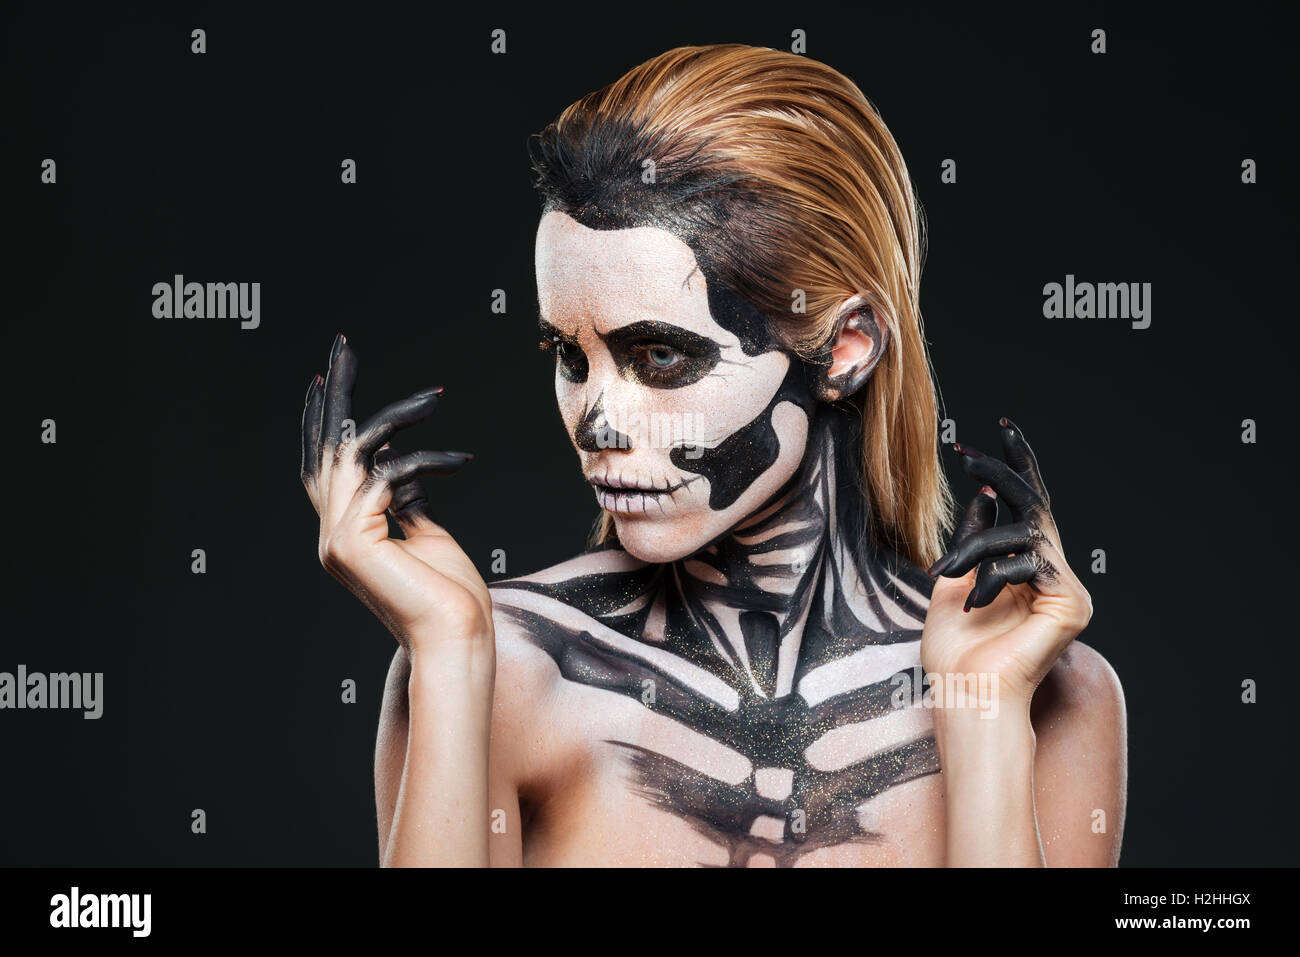 Retrato de chica con miedo halloween maquillaje sobre fondo negro Foto de stock